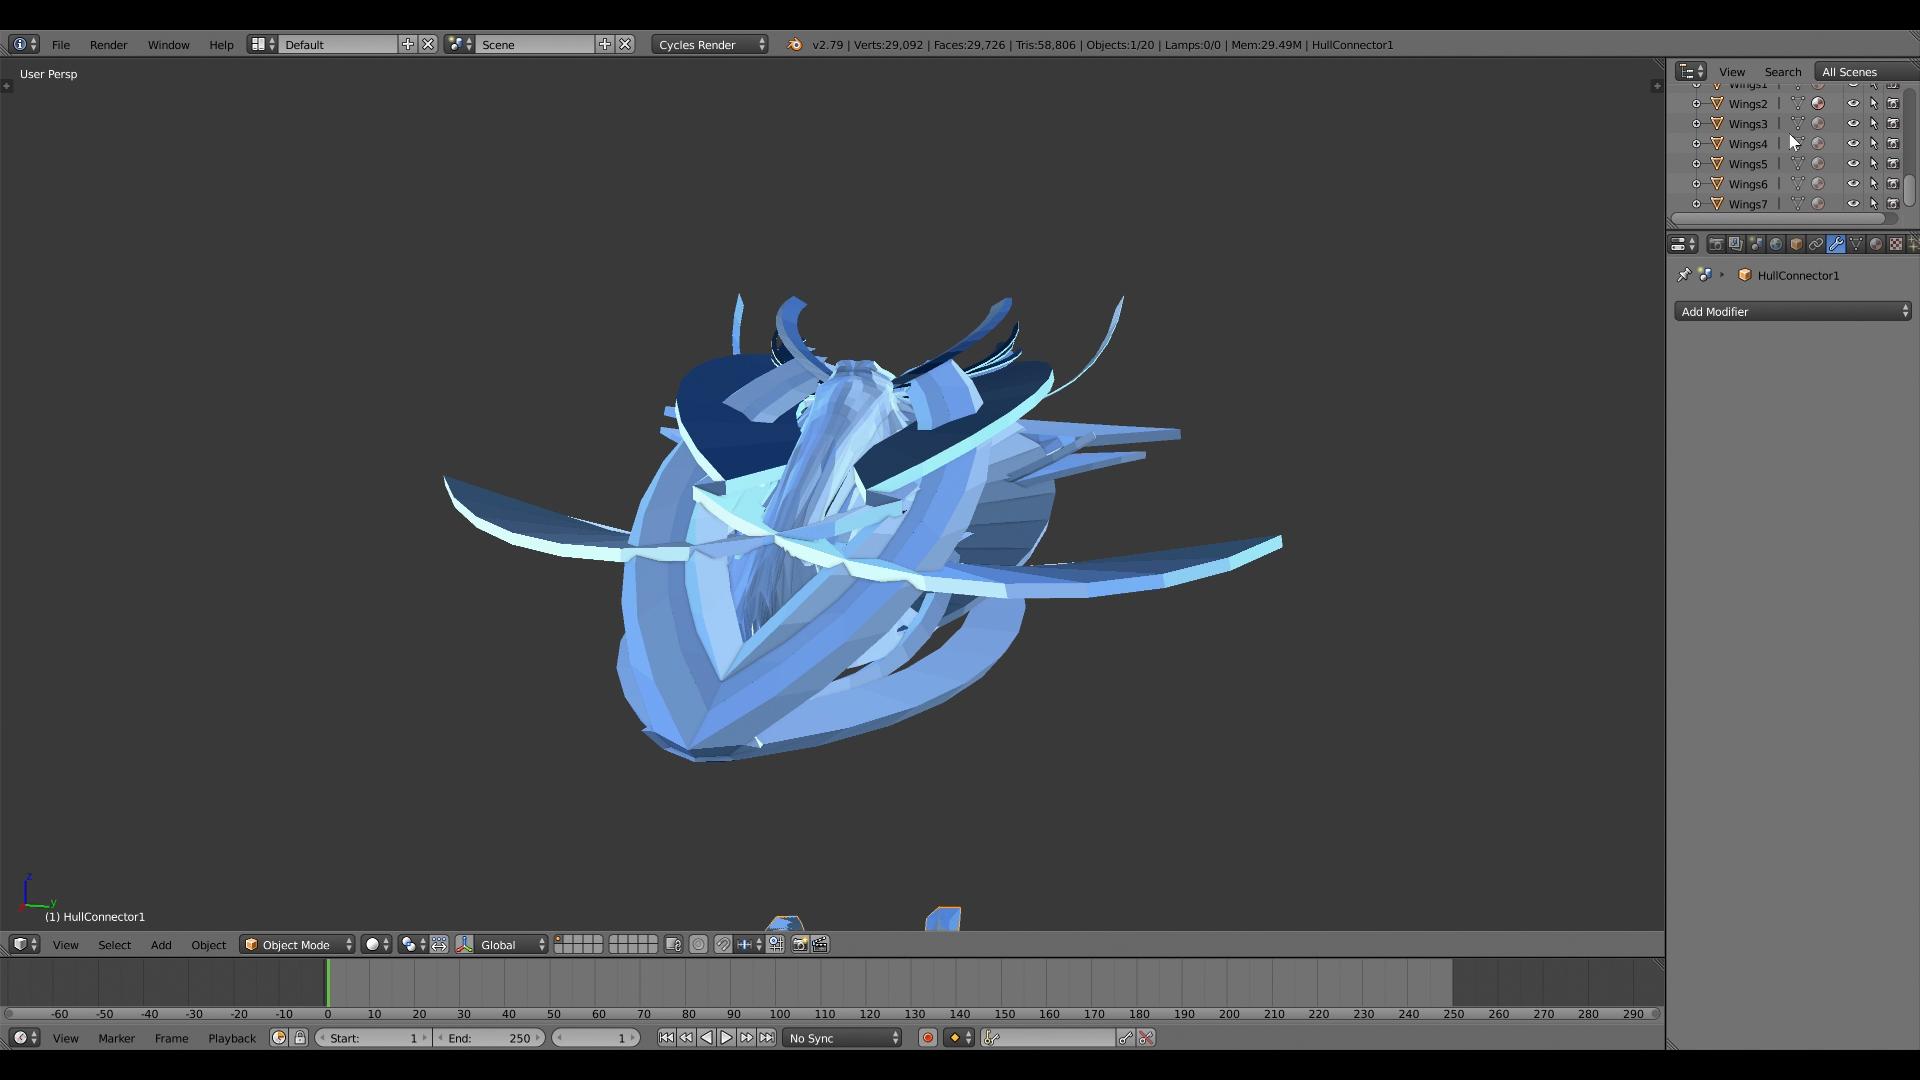 ScreenCaptureExporter1Image2.jpg